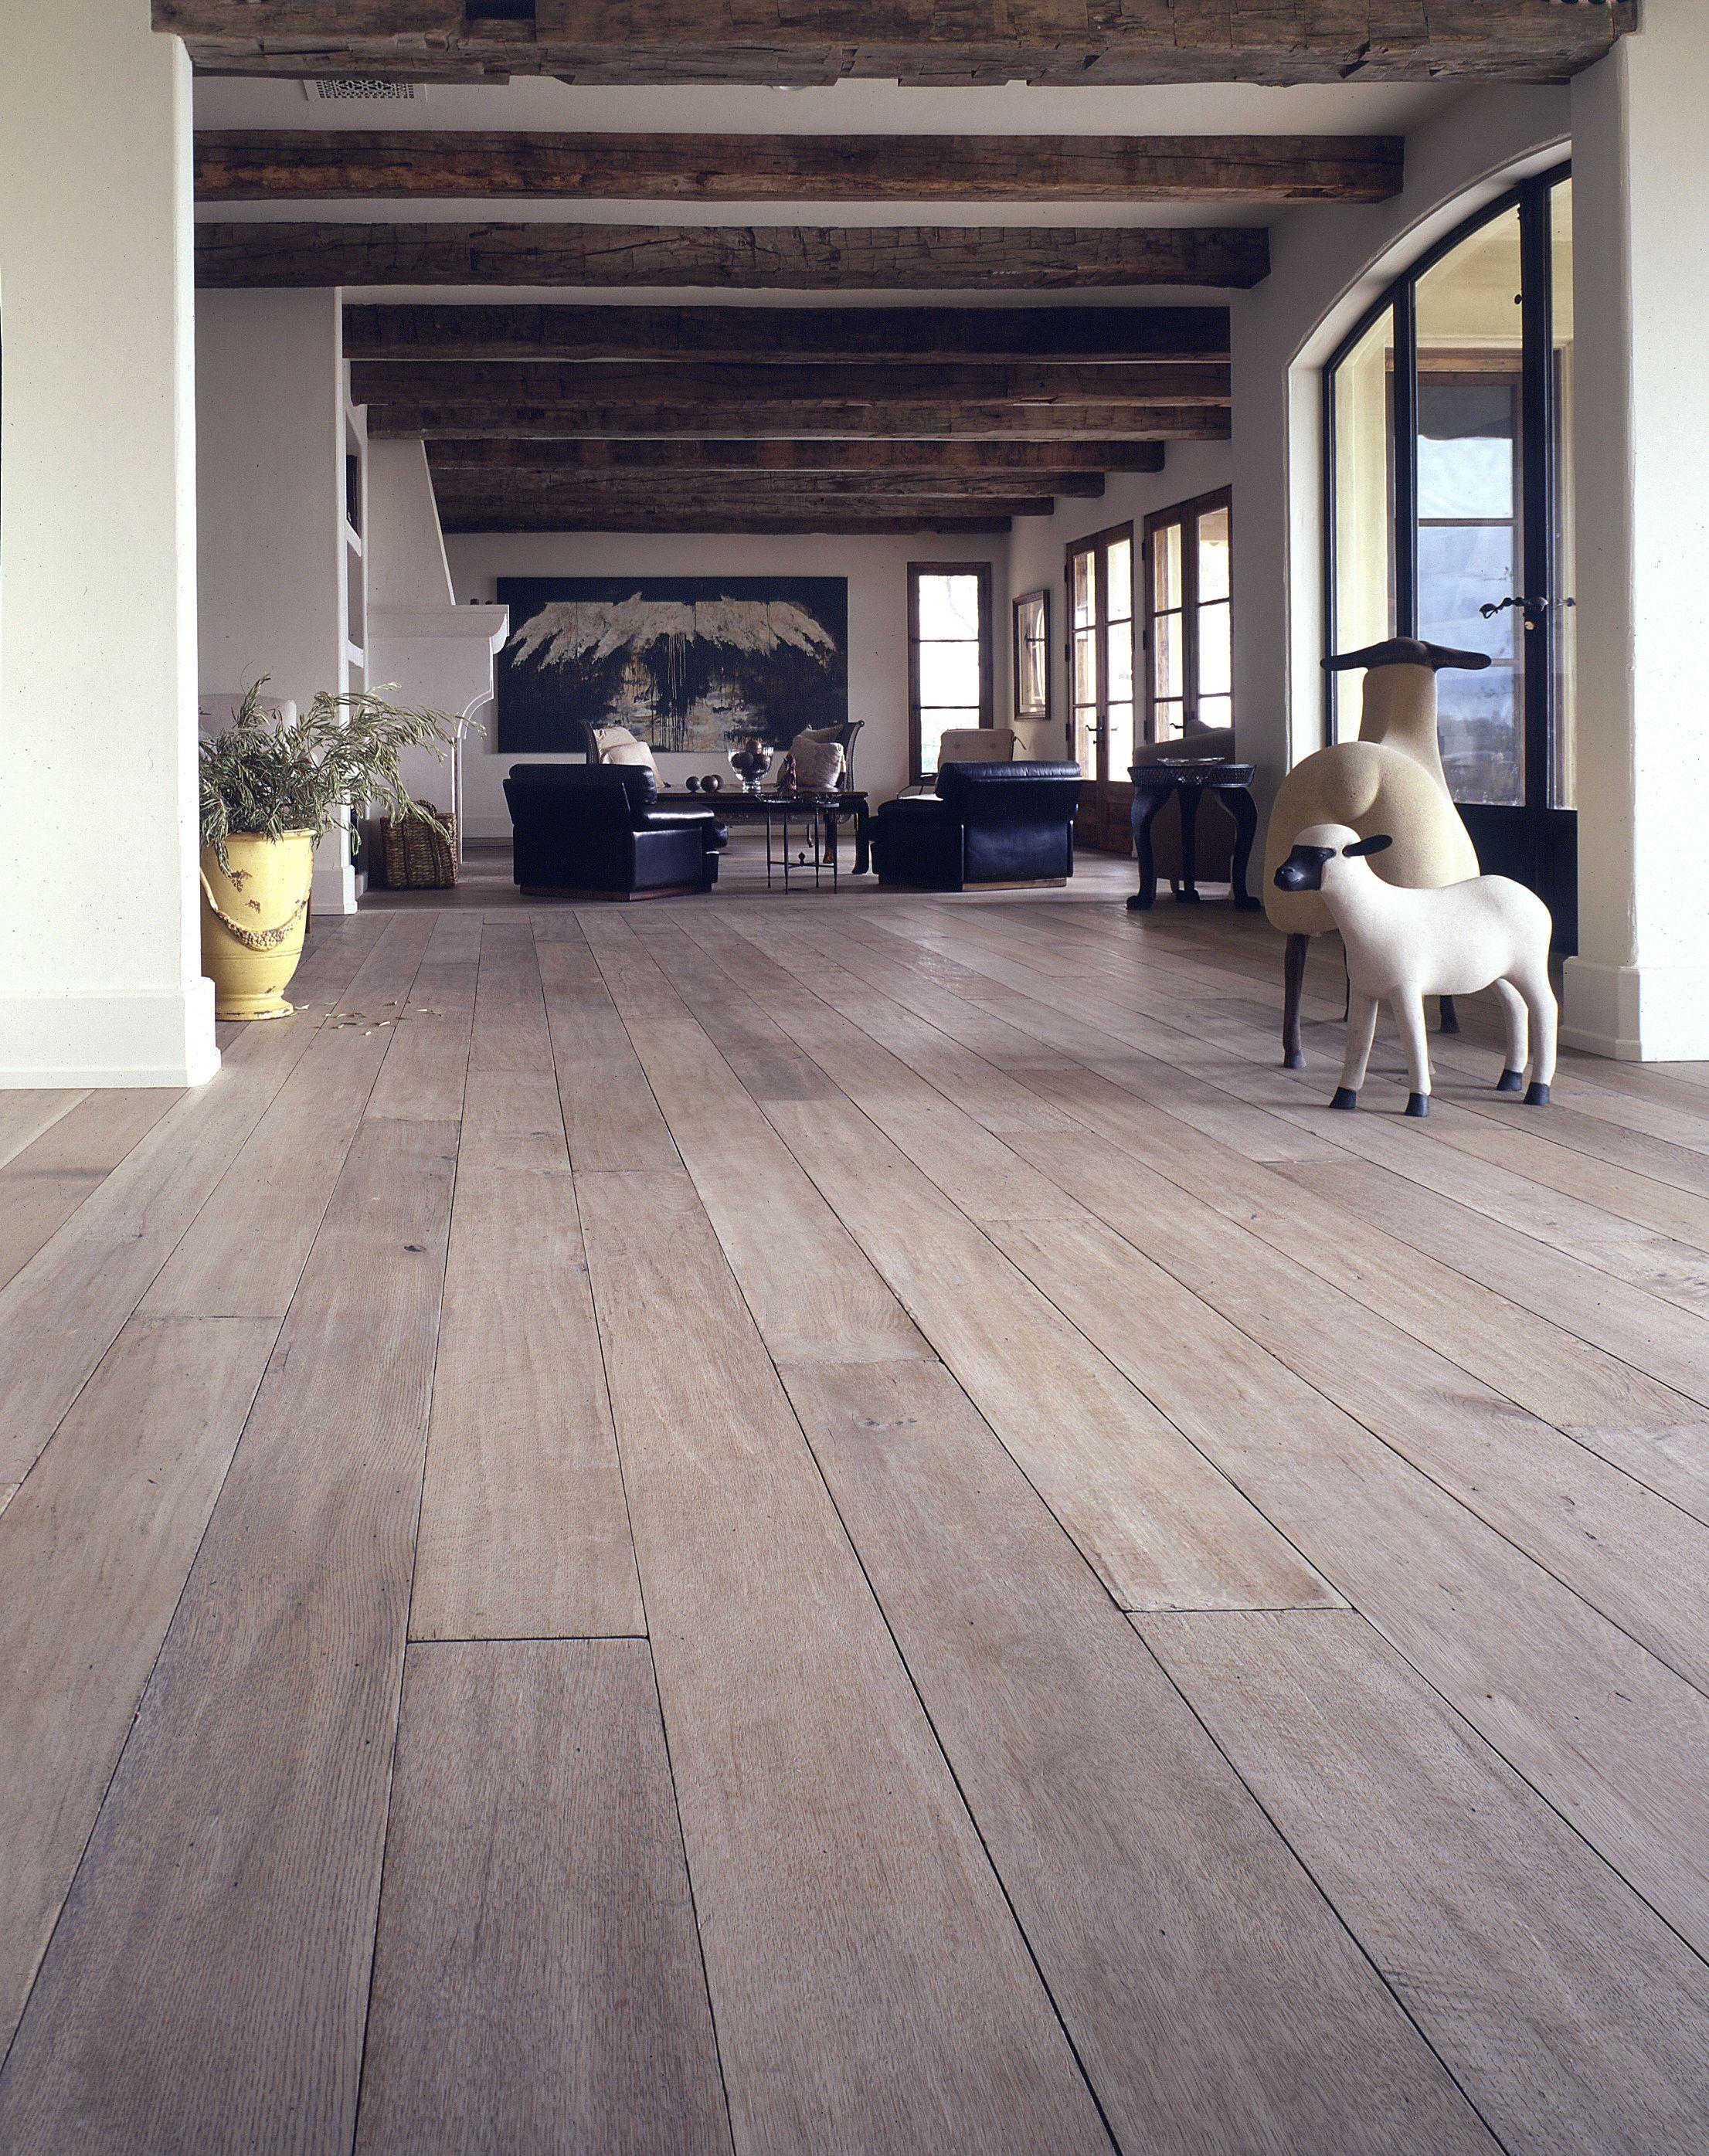 In Vogue White Oak Flooring For Galley Living Room Ideas As Well As Black Furnishing Living Set As Inspiring M White Oak Floors Driftwood Flooring Floor Colors